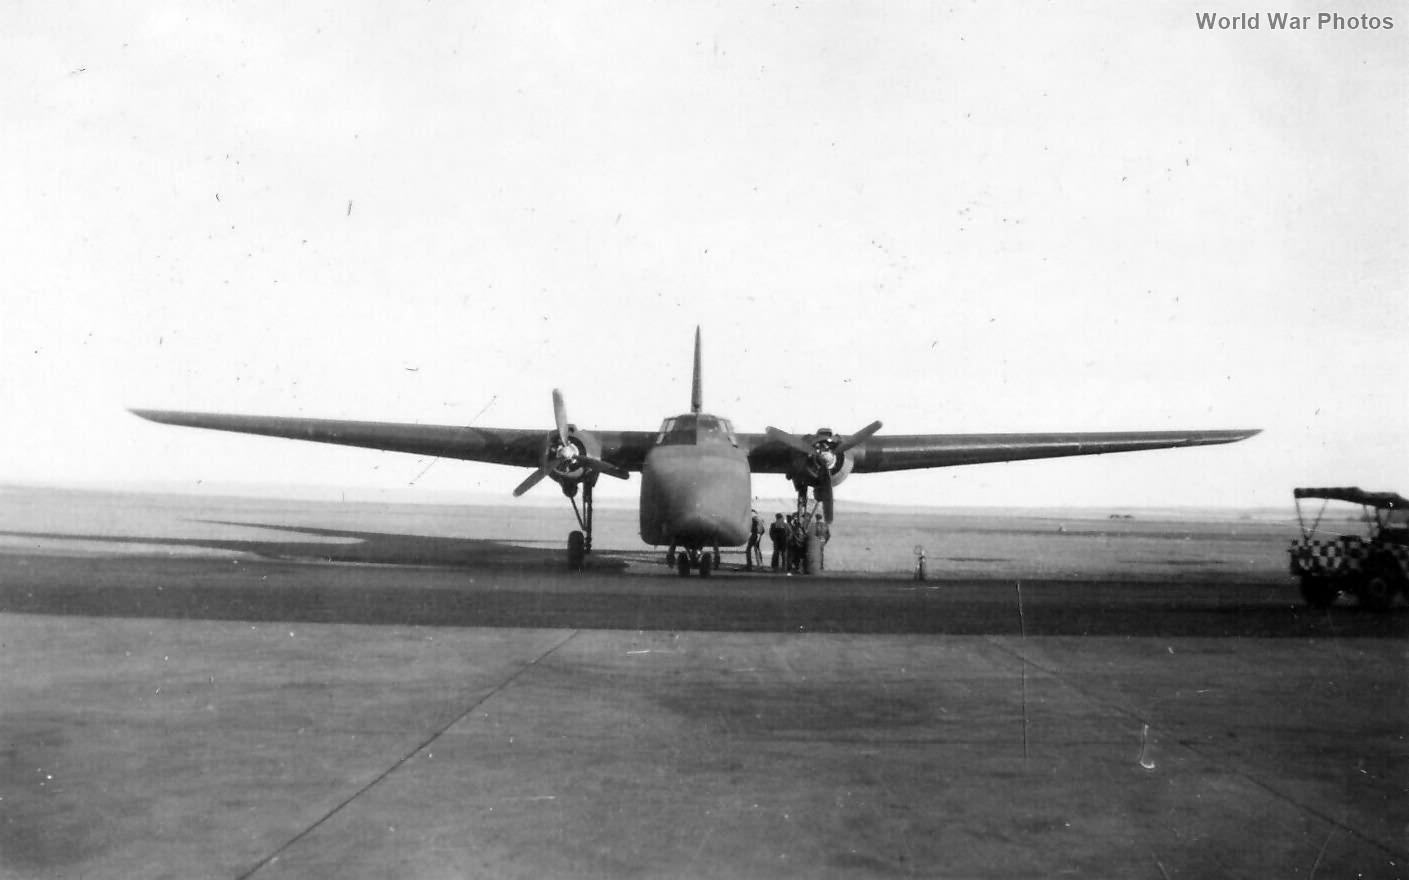 Curtiss-Wright YC-76